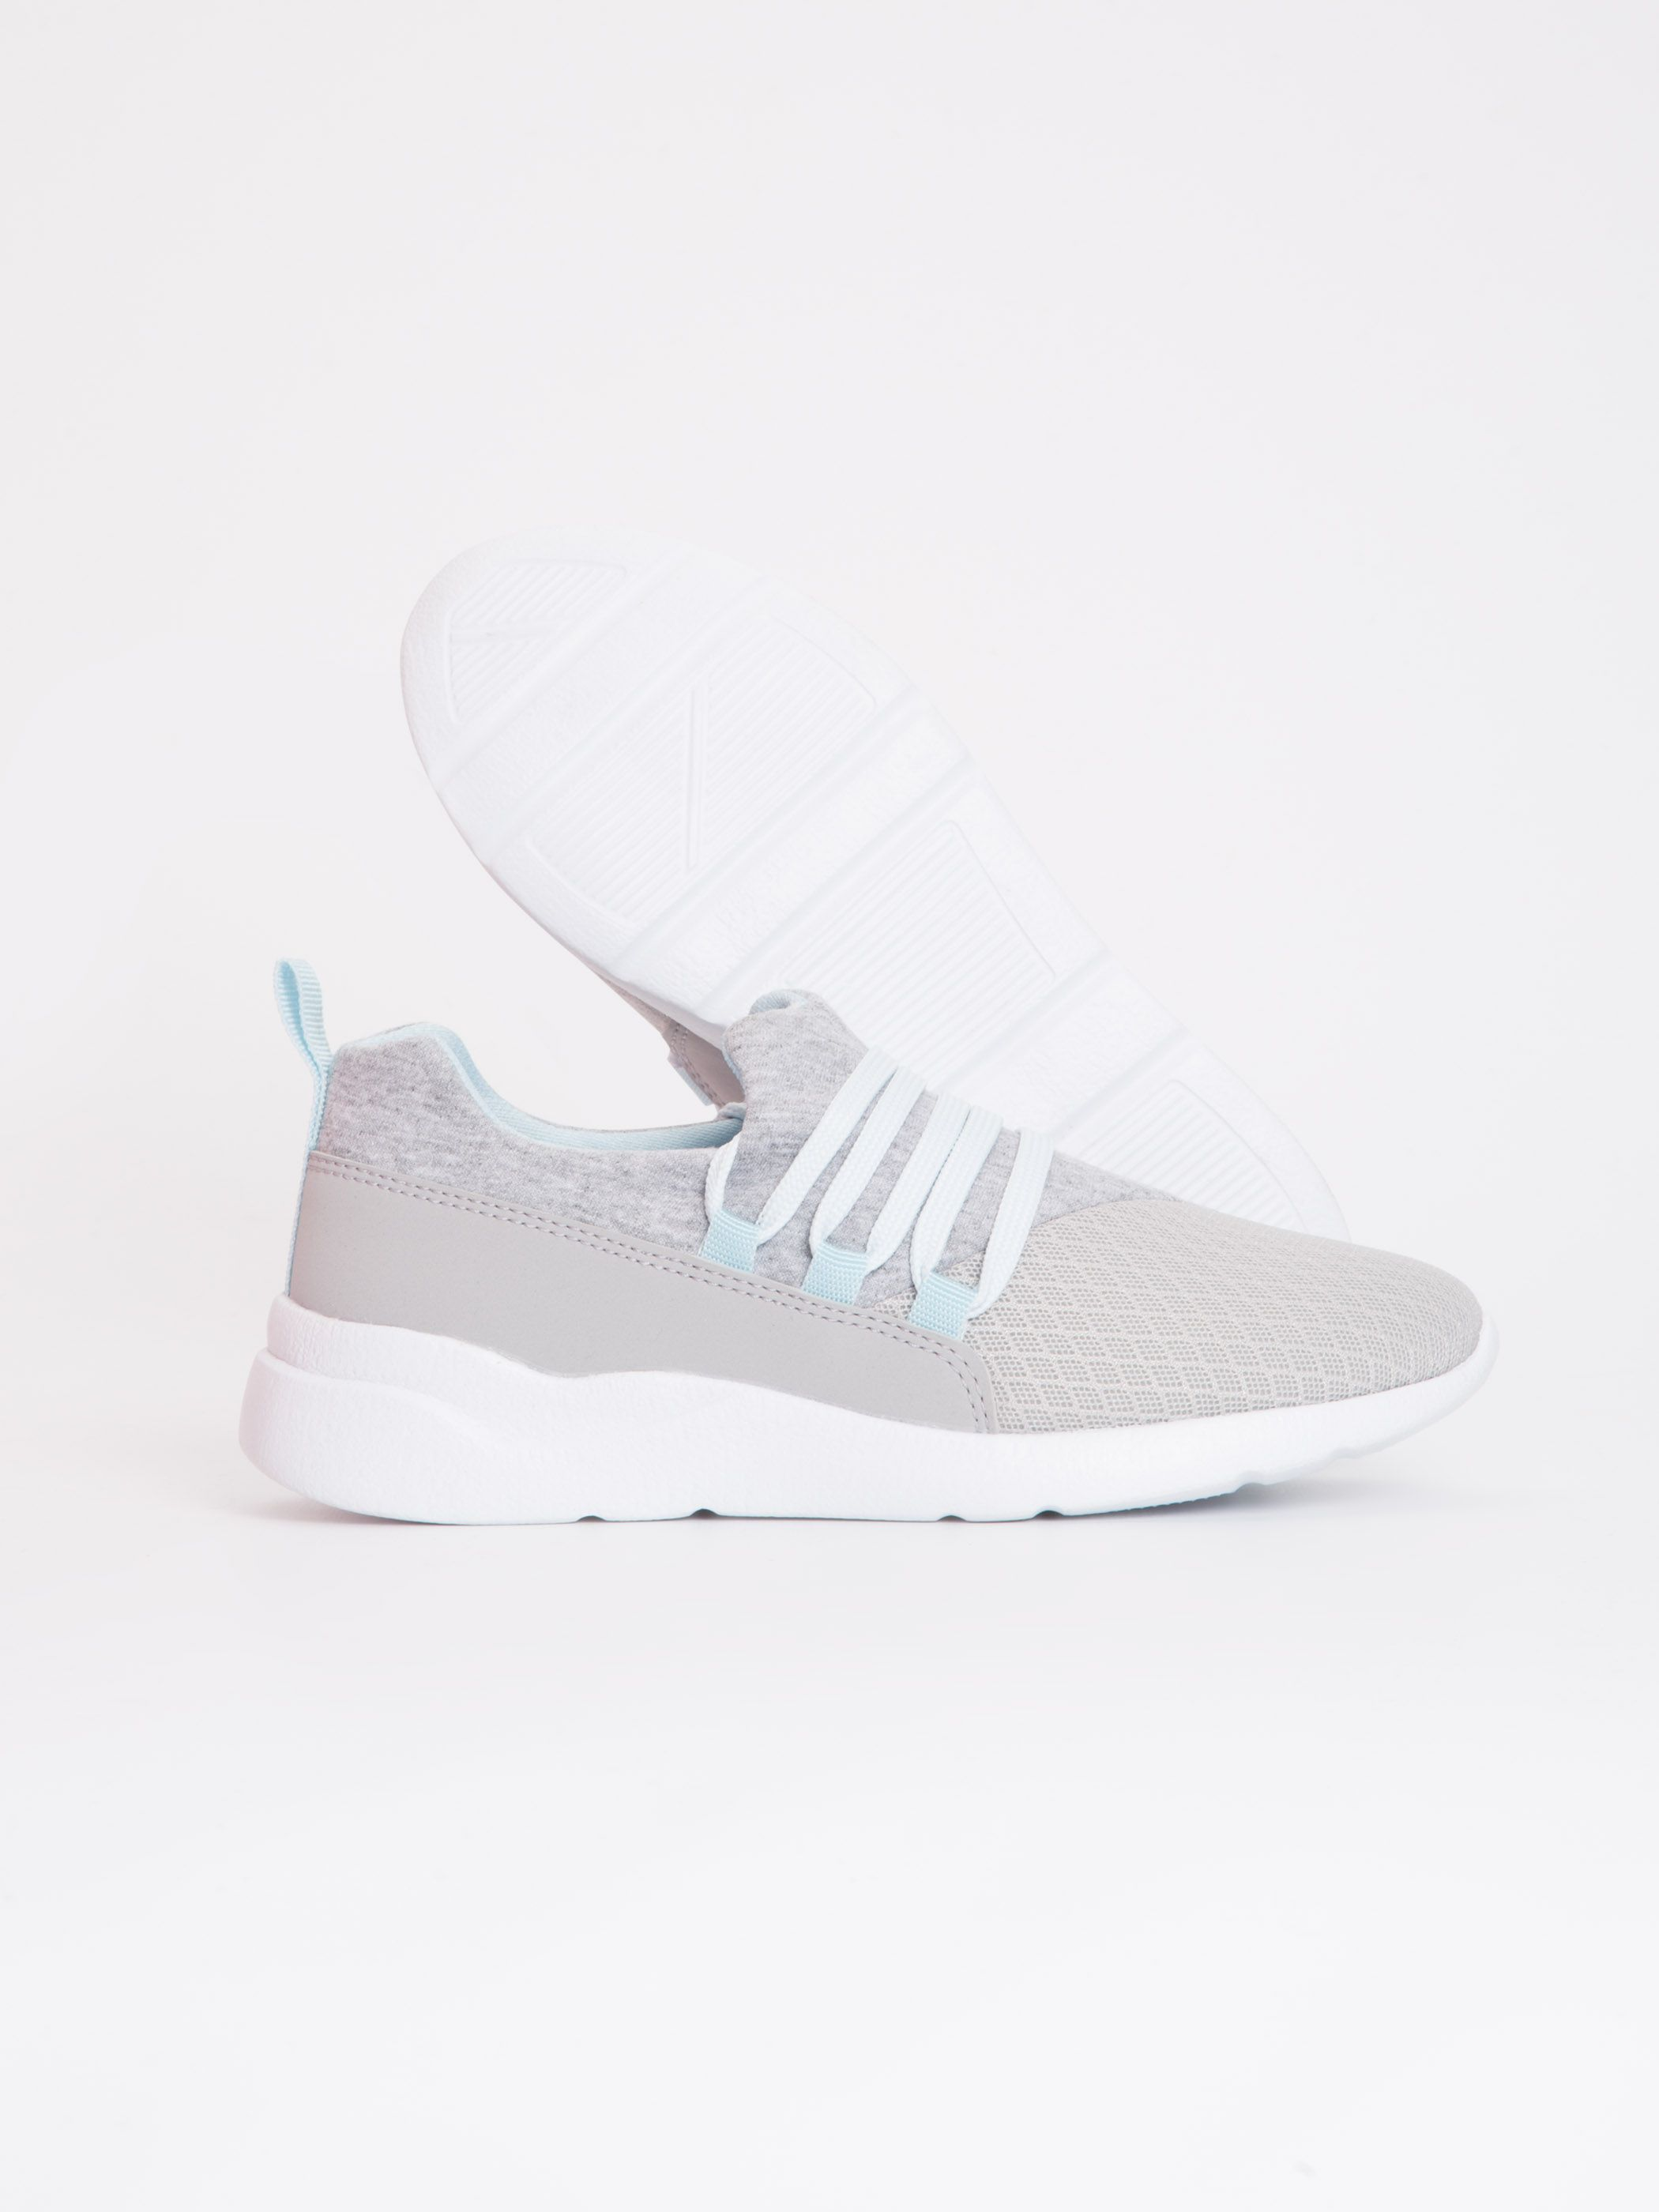 کفش اسپرت طوسی ال سی وایکیکی کتونی Adidas Sneakers Adidas Tubular Adidas Tubular Defiant